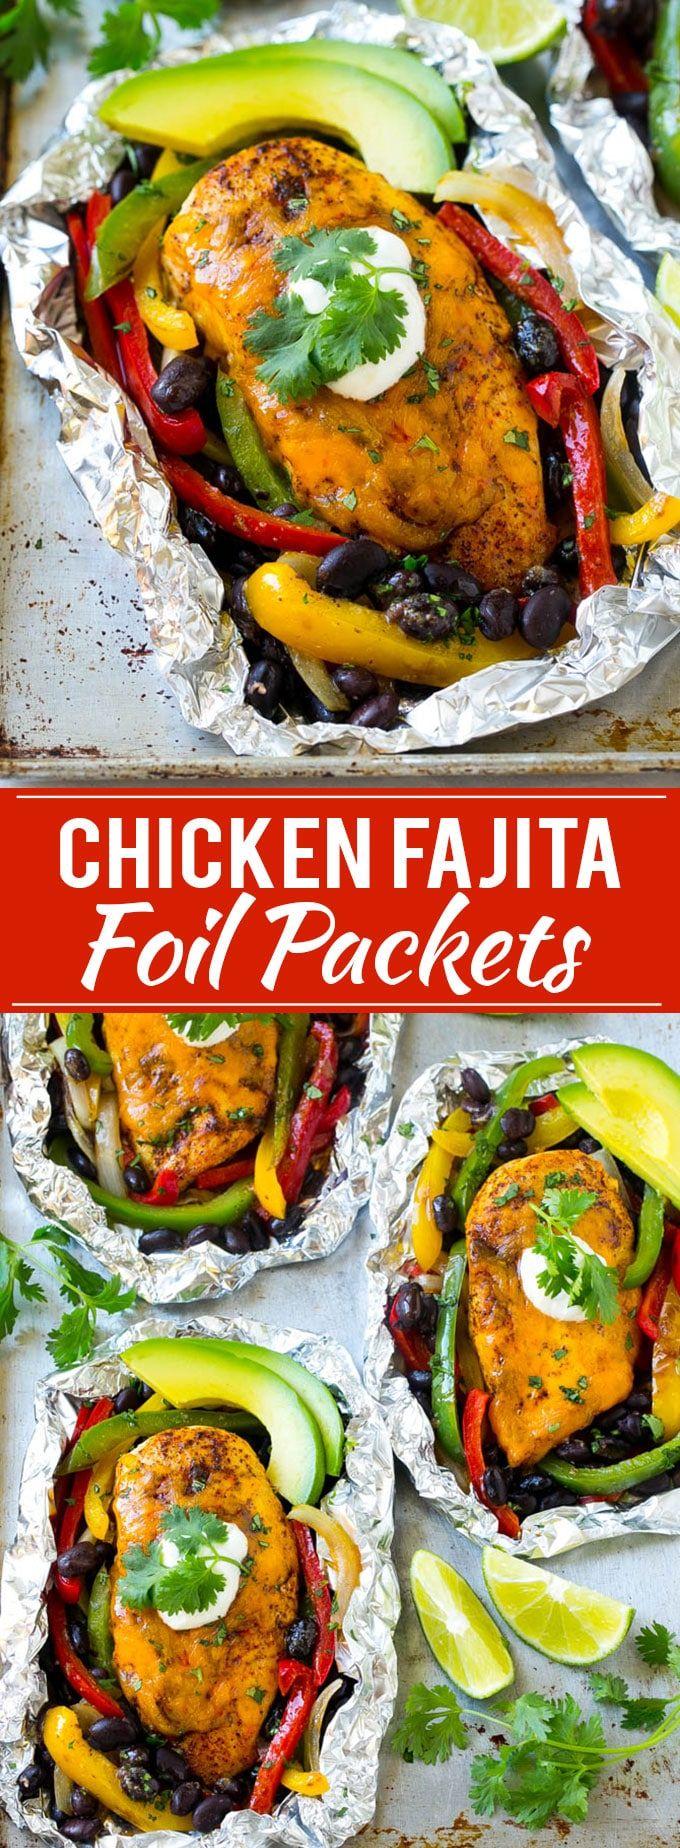 Chicken Fajita Aluminum Package Recipe | Fajita chicken recipe | Foil Pack Recipe | M …   – NOM NOM NOM NOM!!! :D